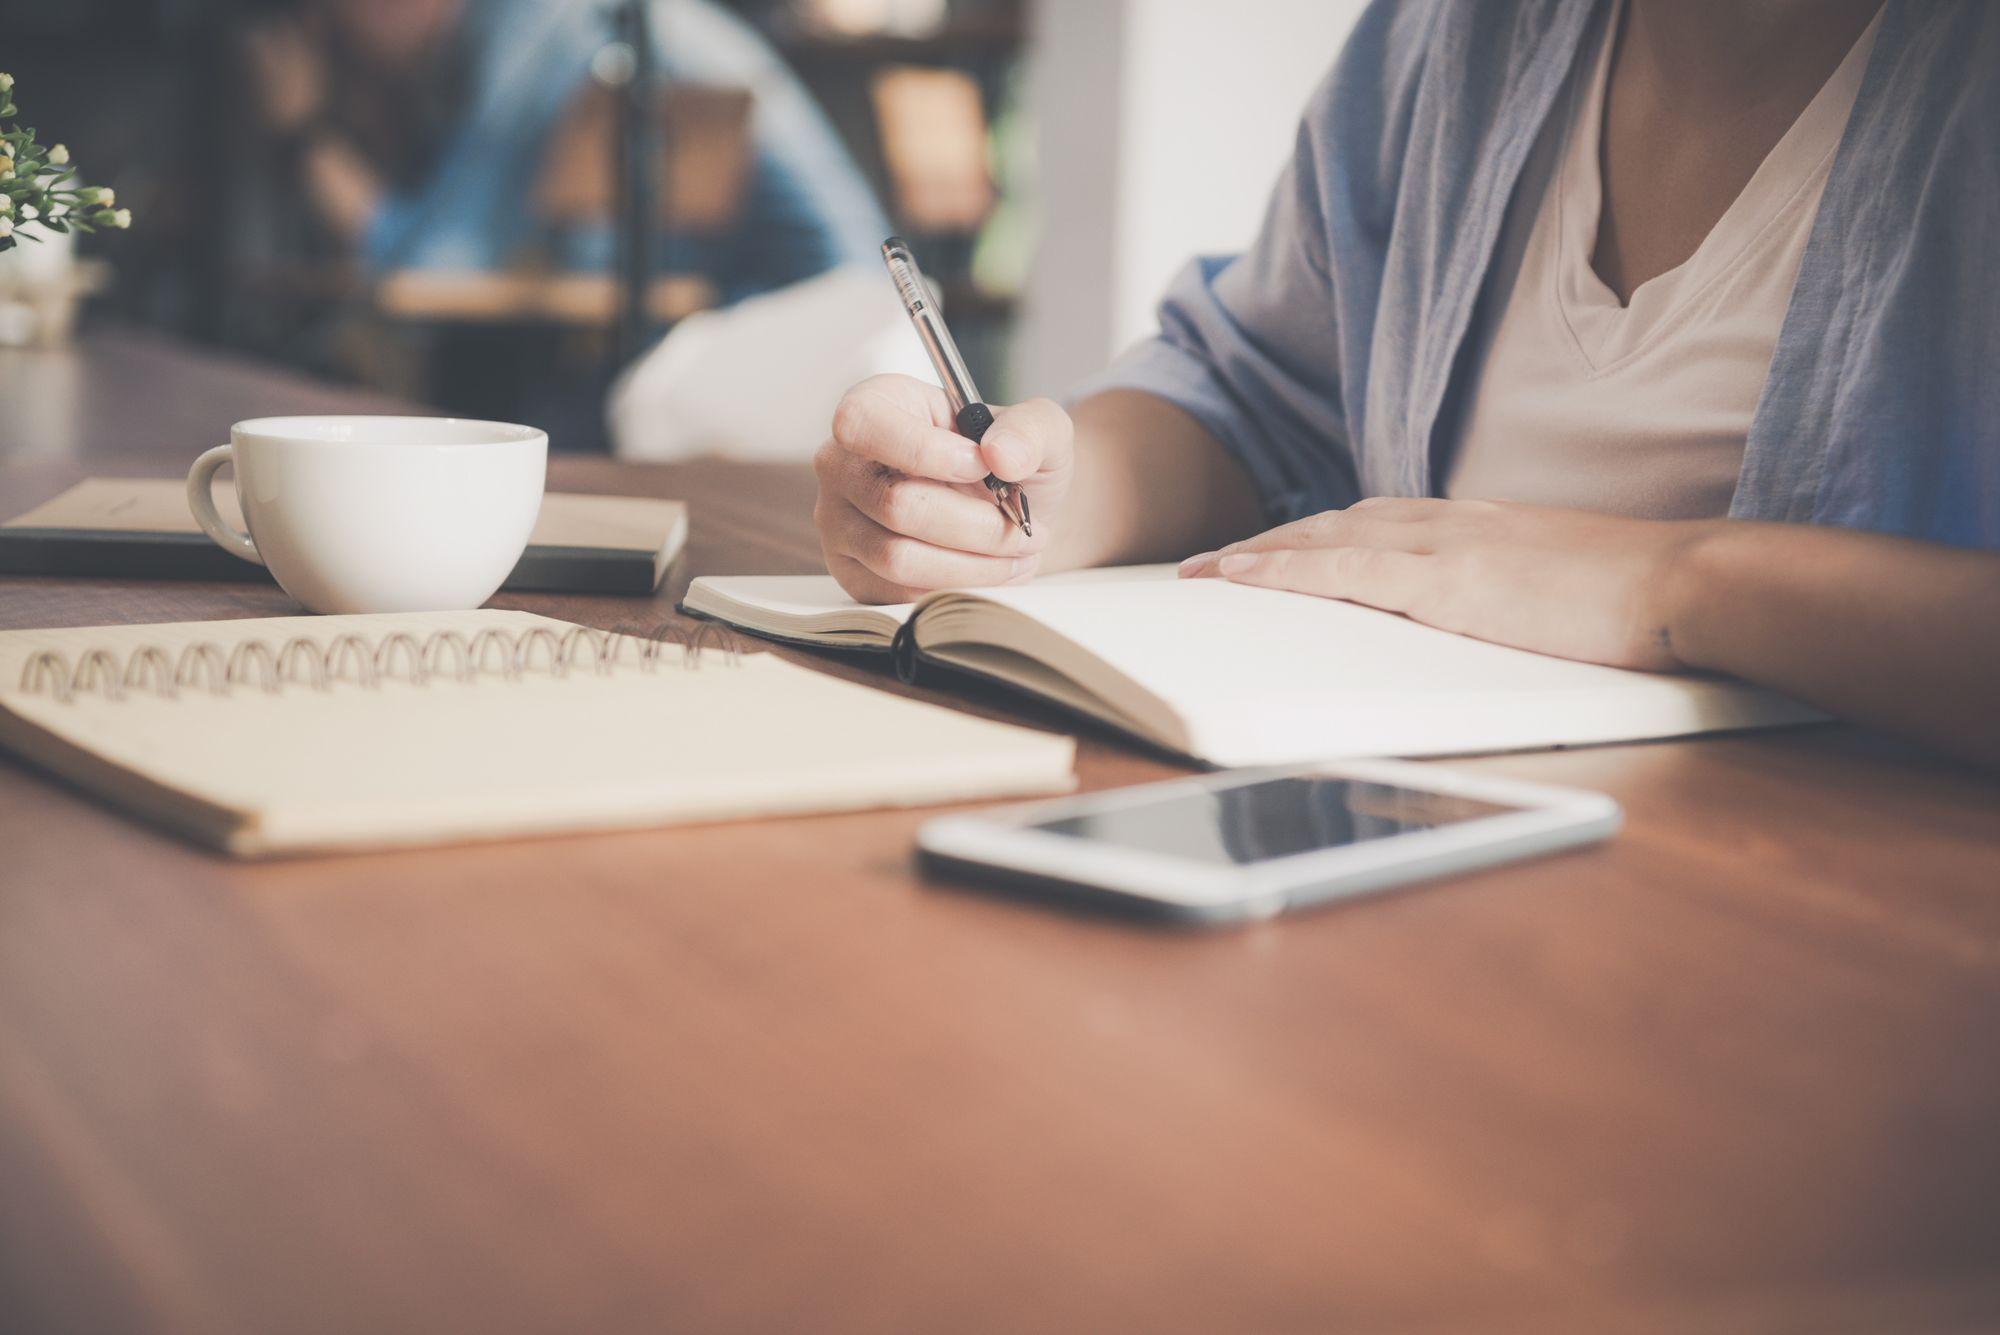 E-Learning in einem Café: ortsungebundenes & flexibles Lernen mit Tablet